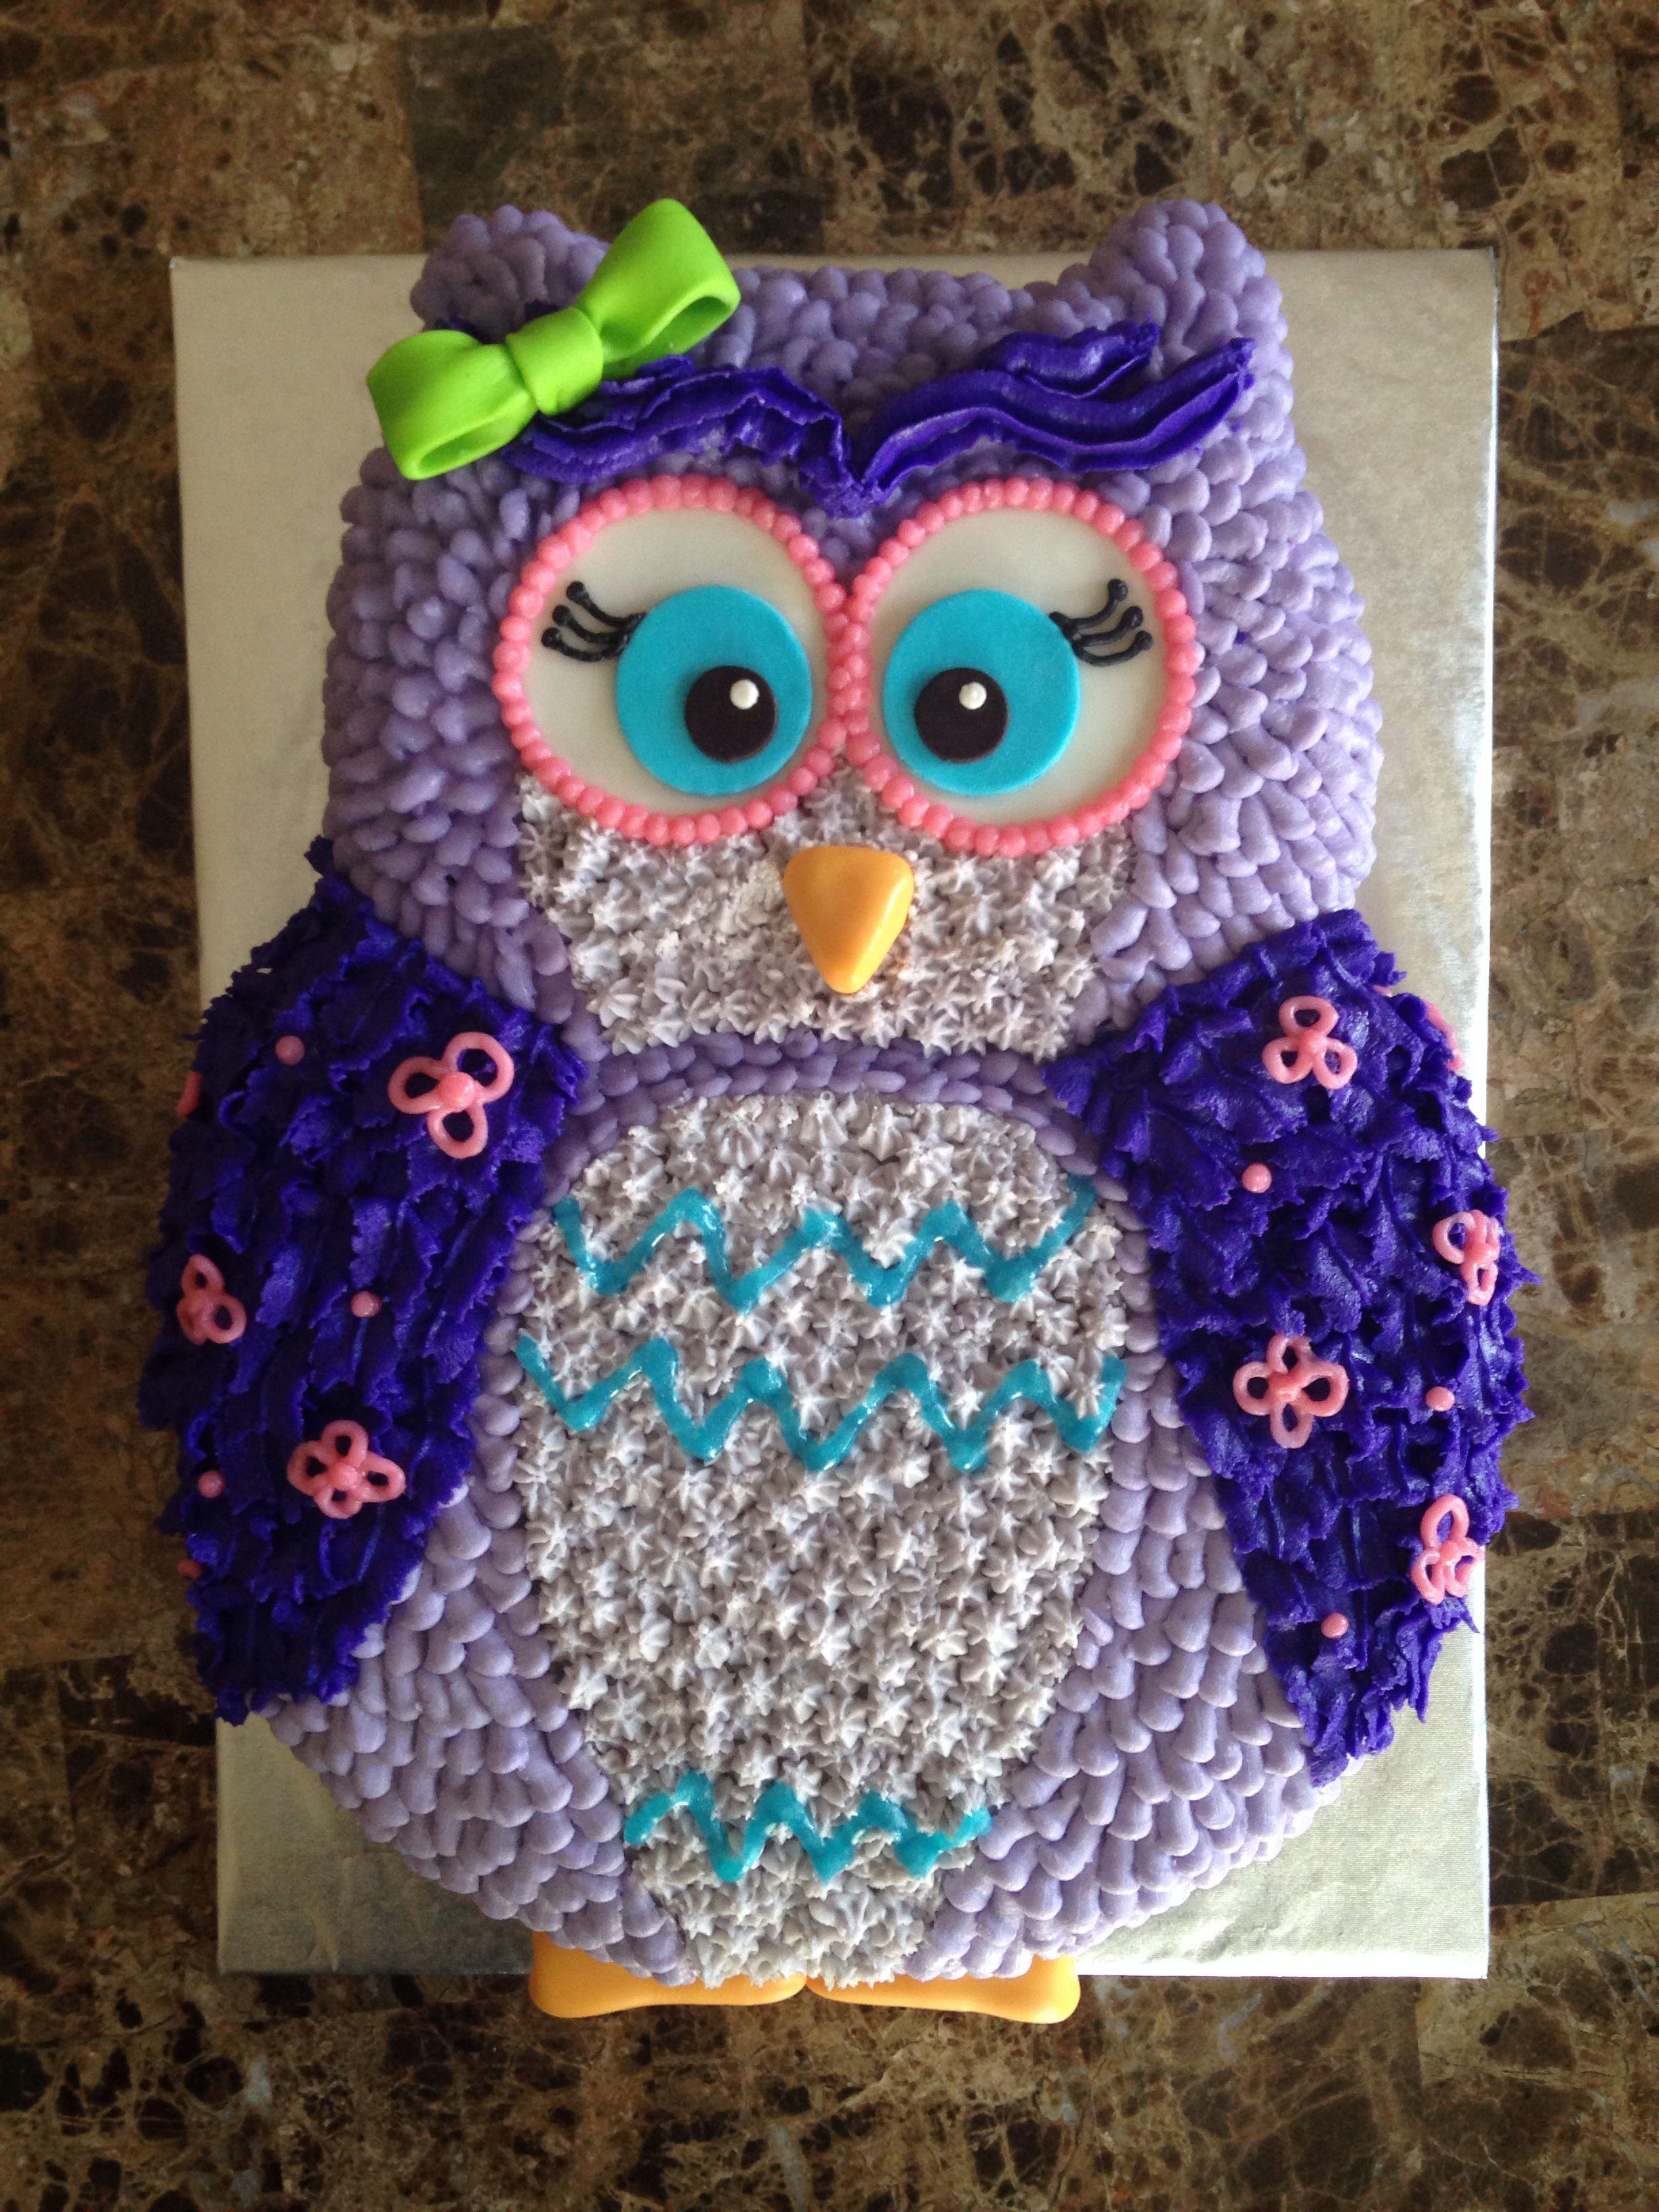 Buttercream Owl Cake Cakes Pinterest Owl Cakes Owl And Cake